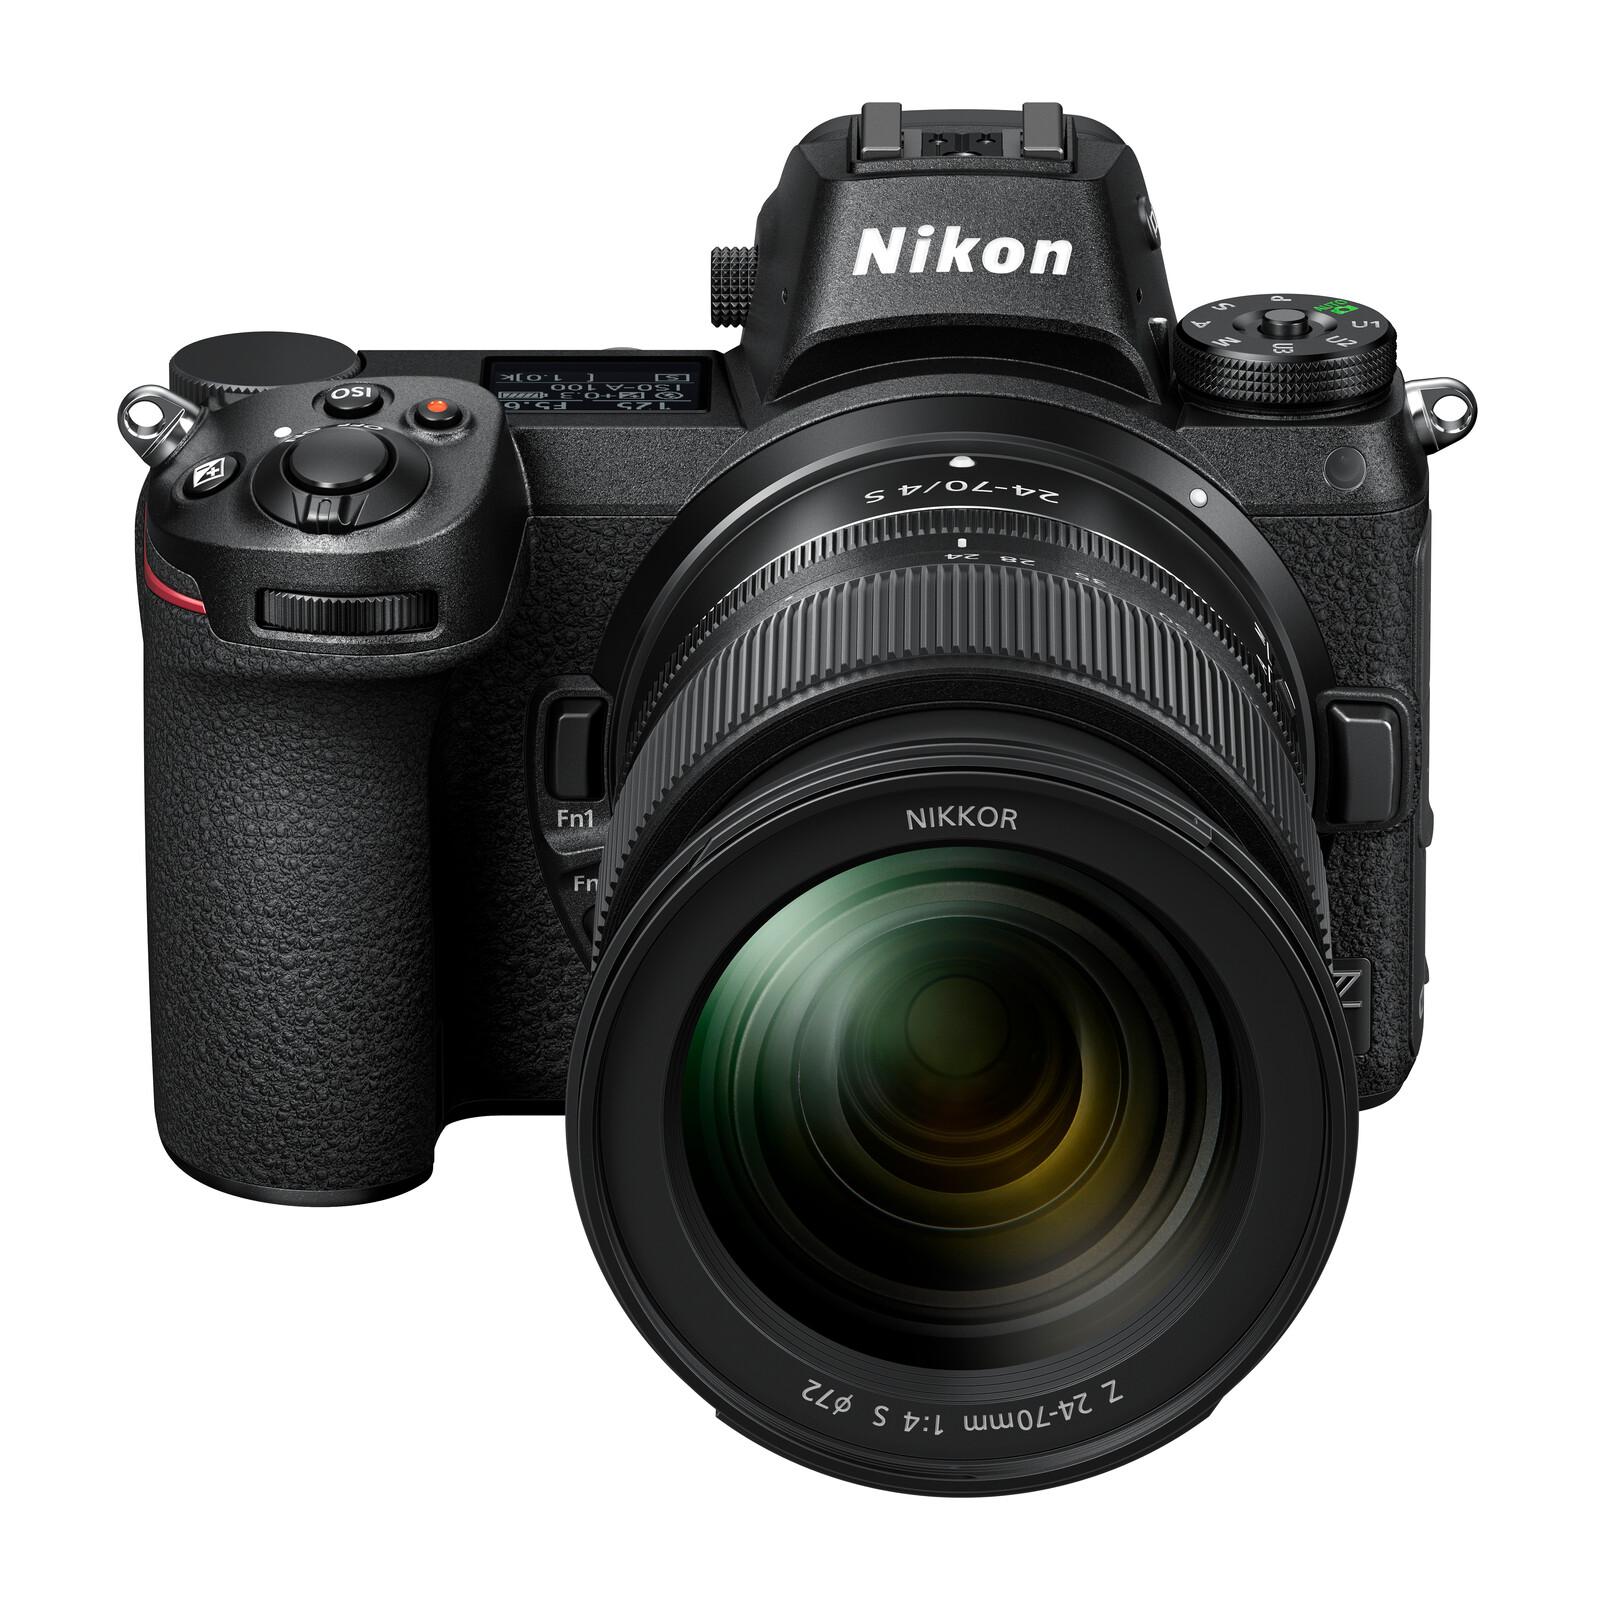 Nikon Z6 +Nikkor Z 24-70mm/4,0S + FTZ Adapter + 64GB XQD